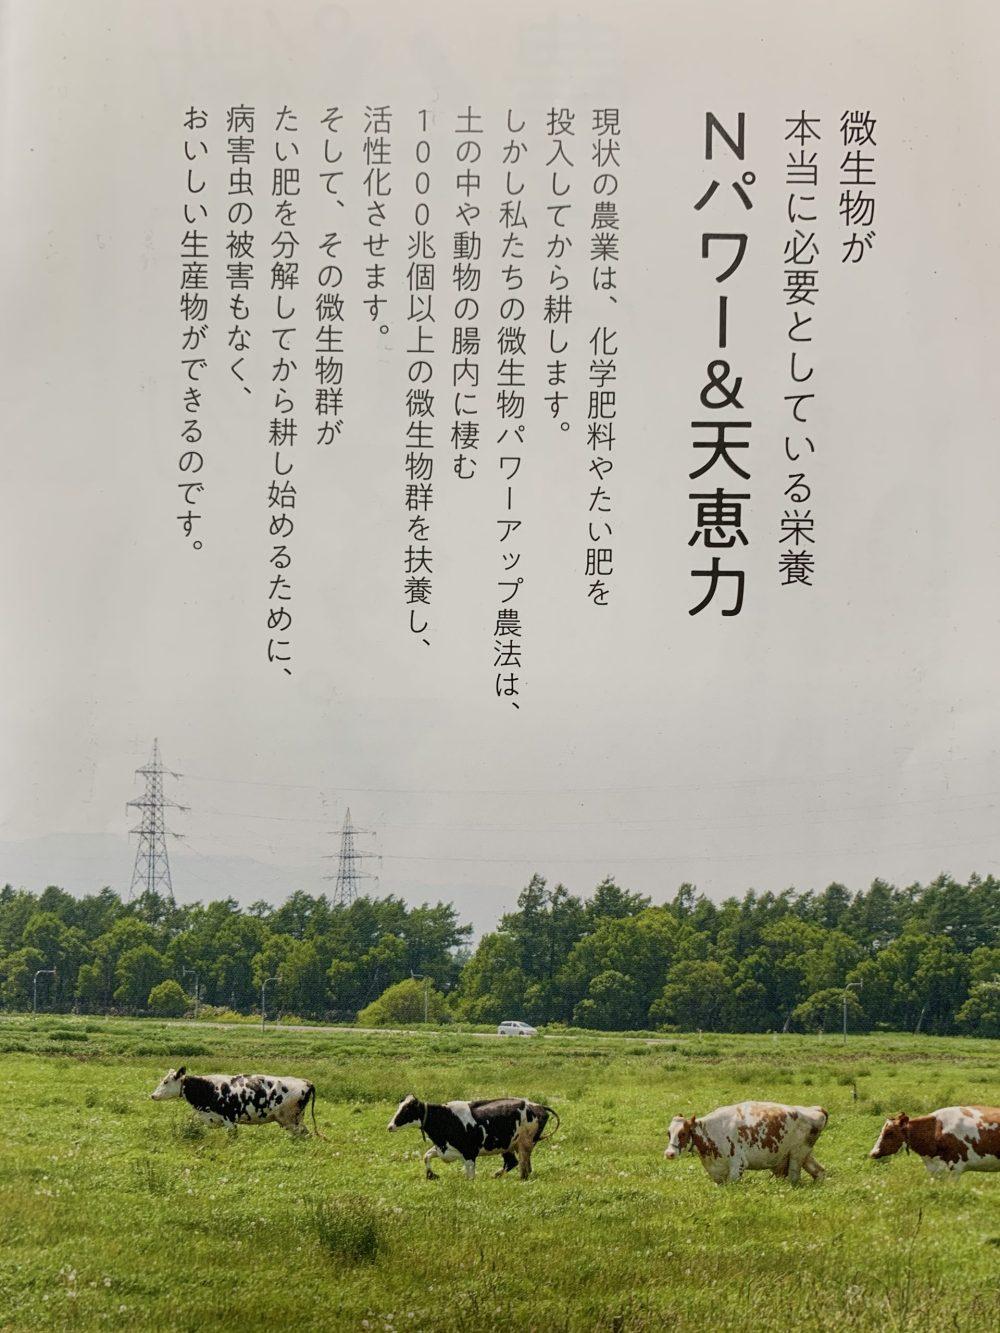 「微生物農法」の真実